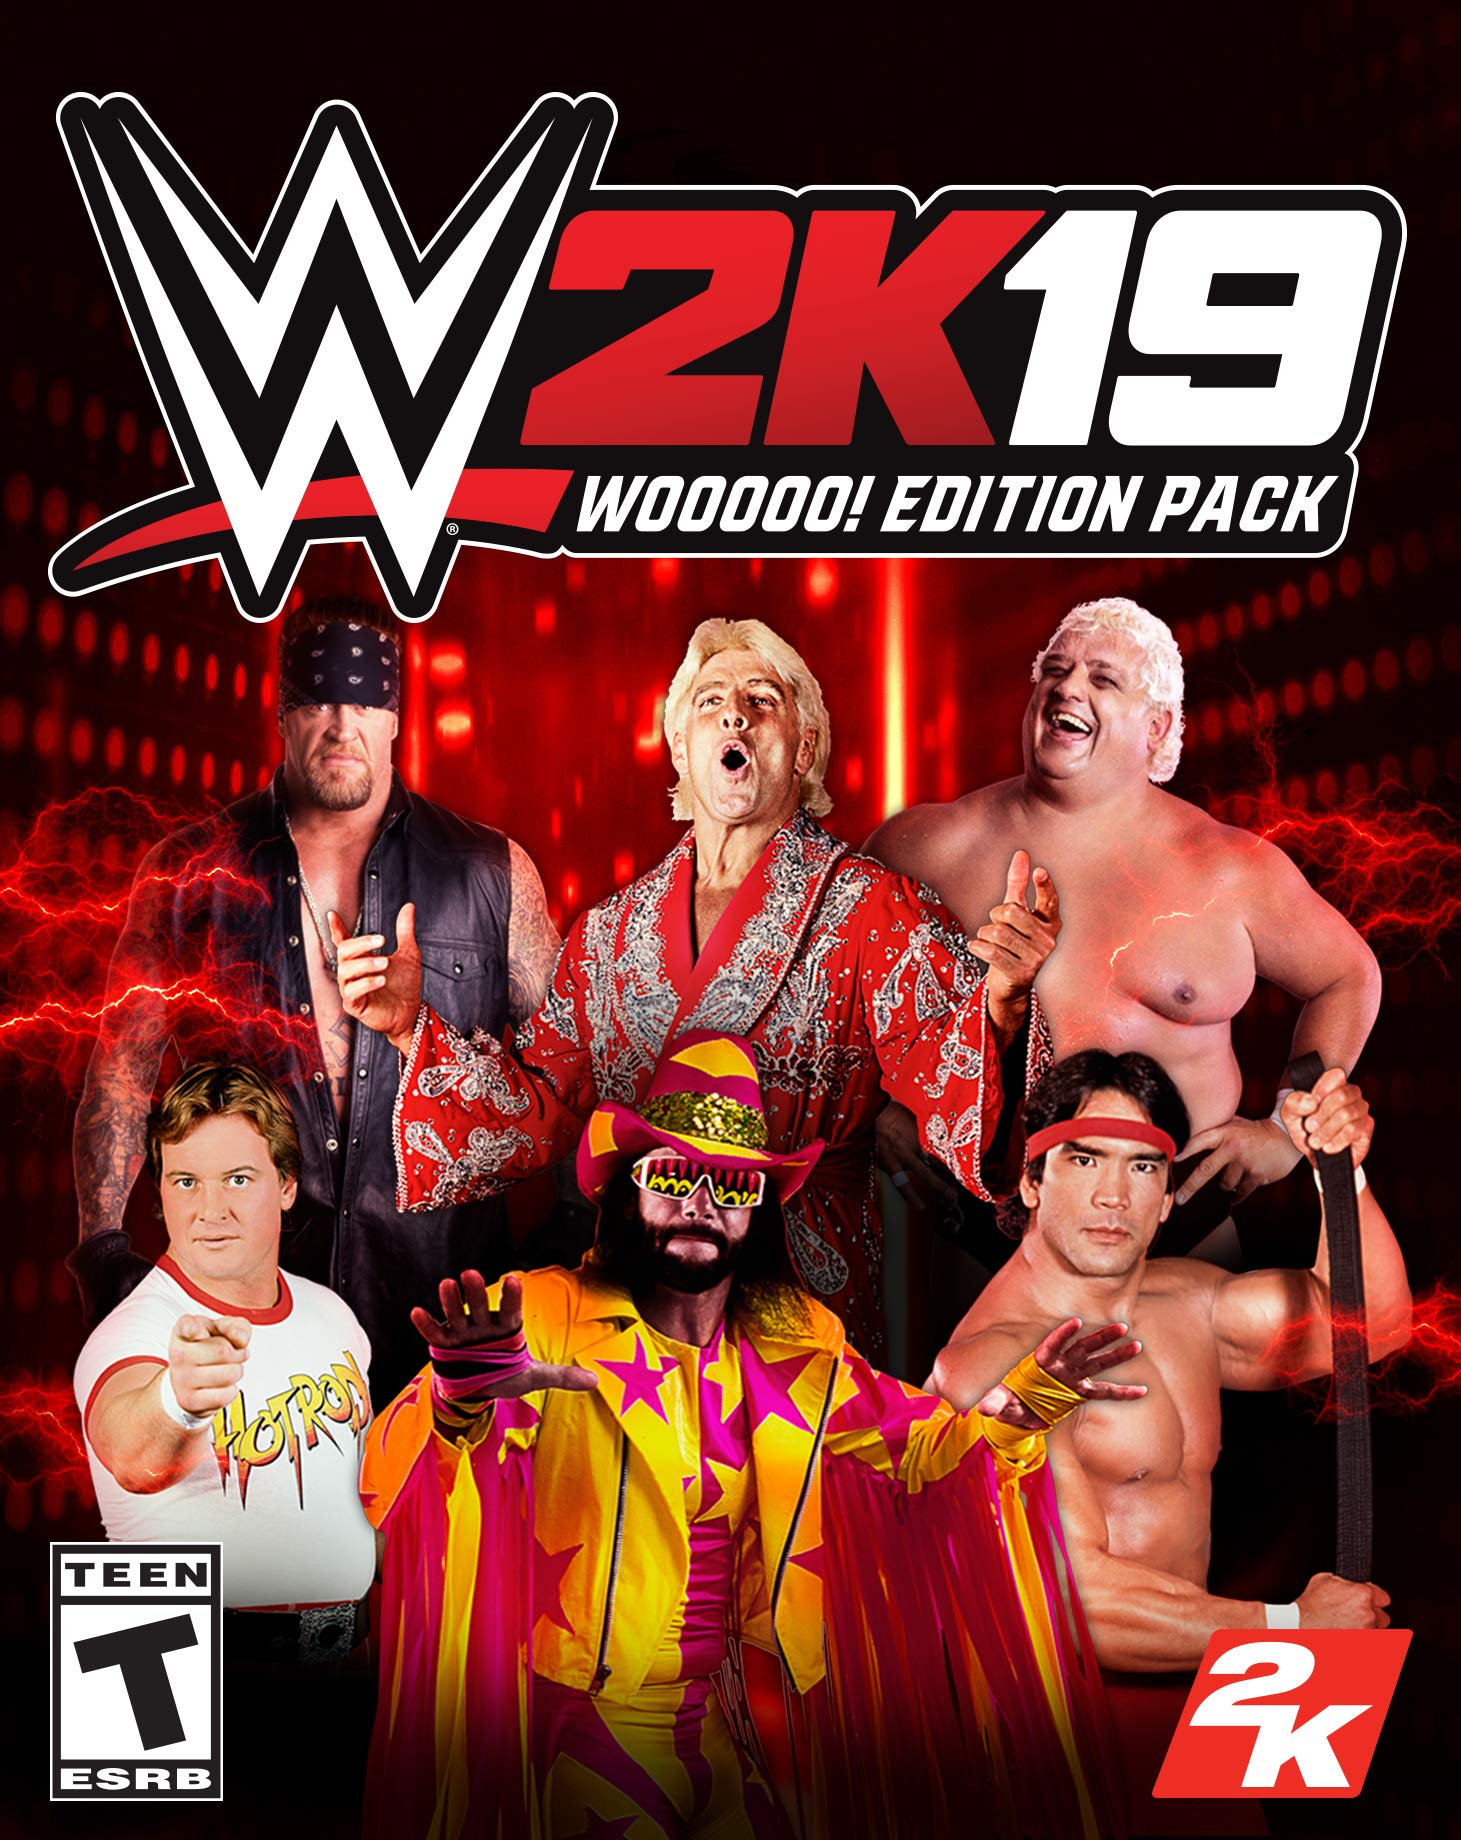 Amazon com: WWE 2K19 Wooooo! Edition Pack! [Online Game Code